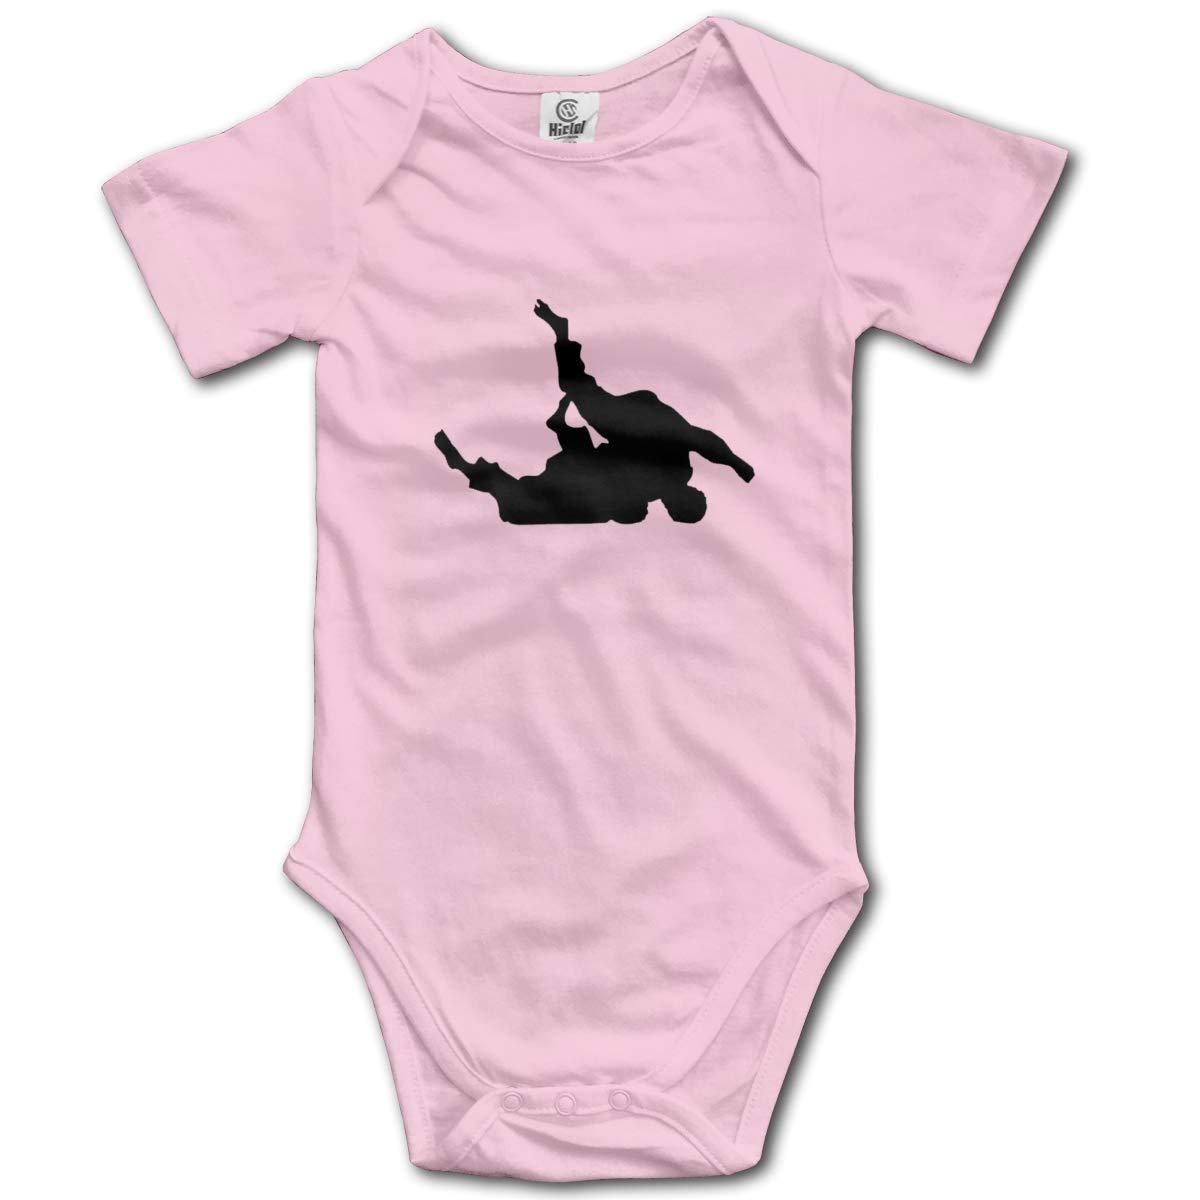 Coollifea Judo Baby Romper 0-18 Months Newborn Baby Girls Boys Layette Rompers Black